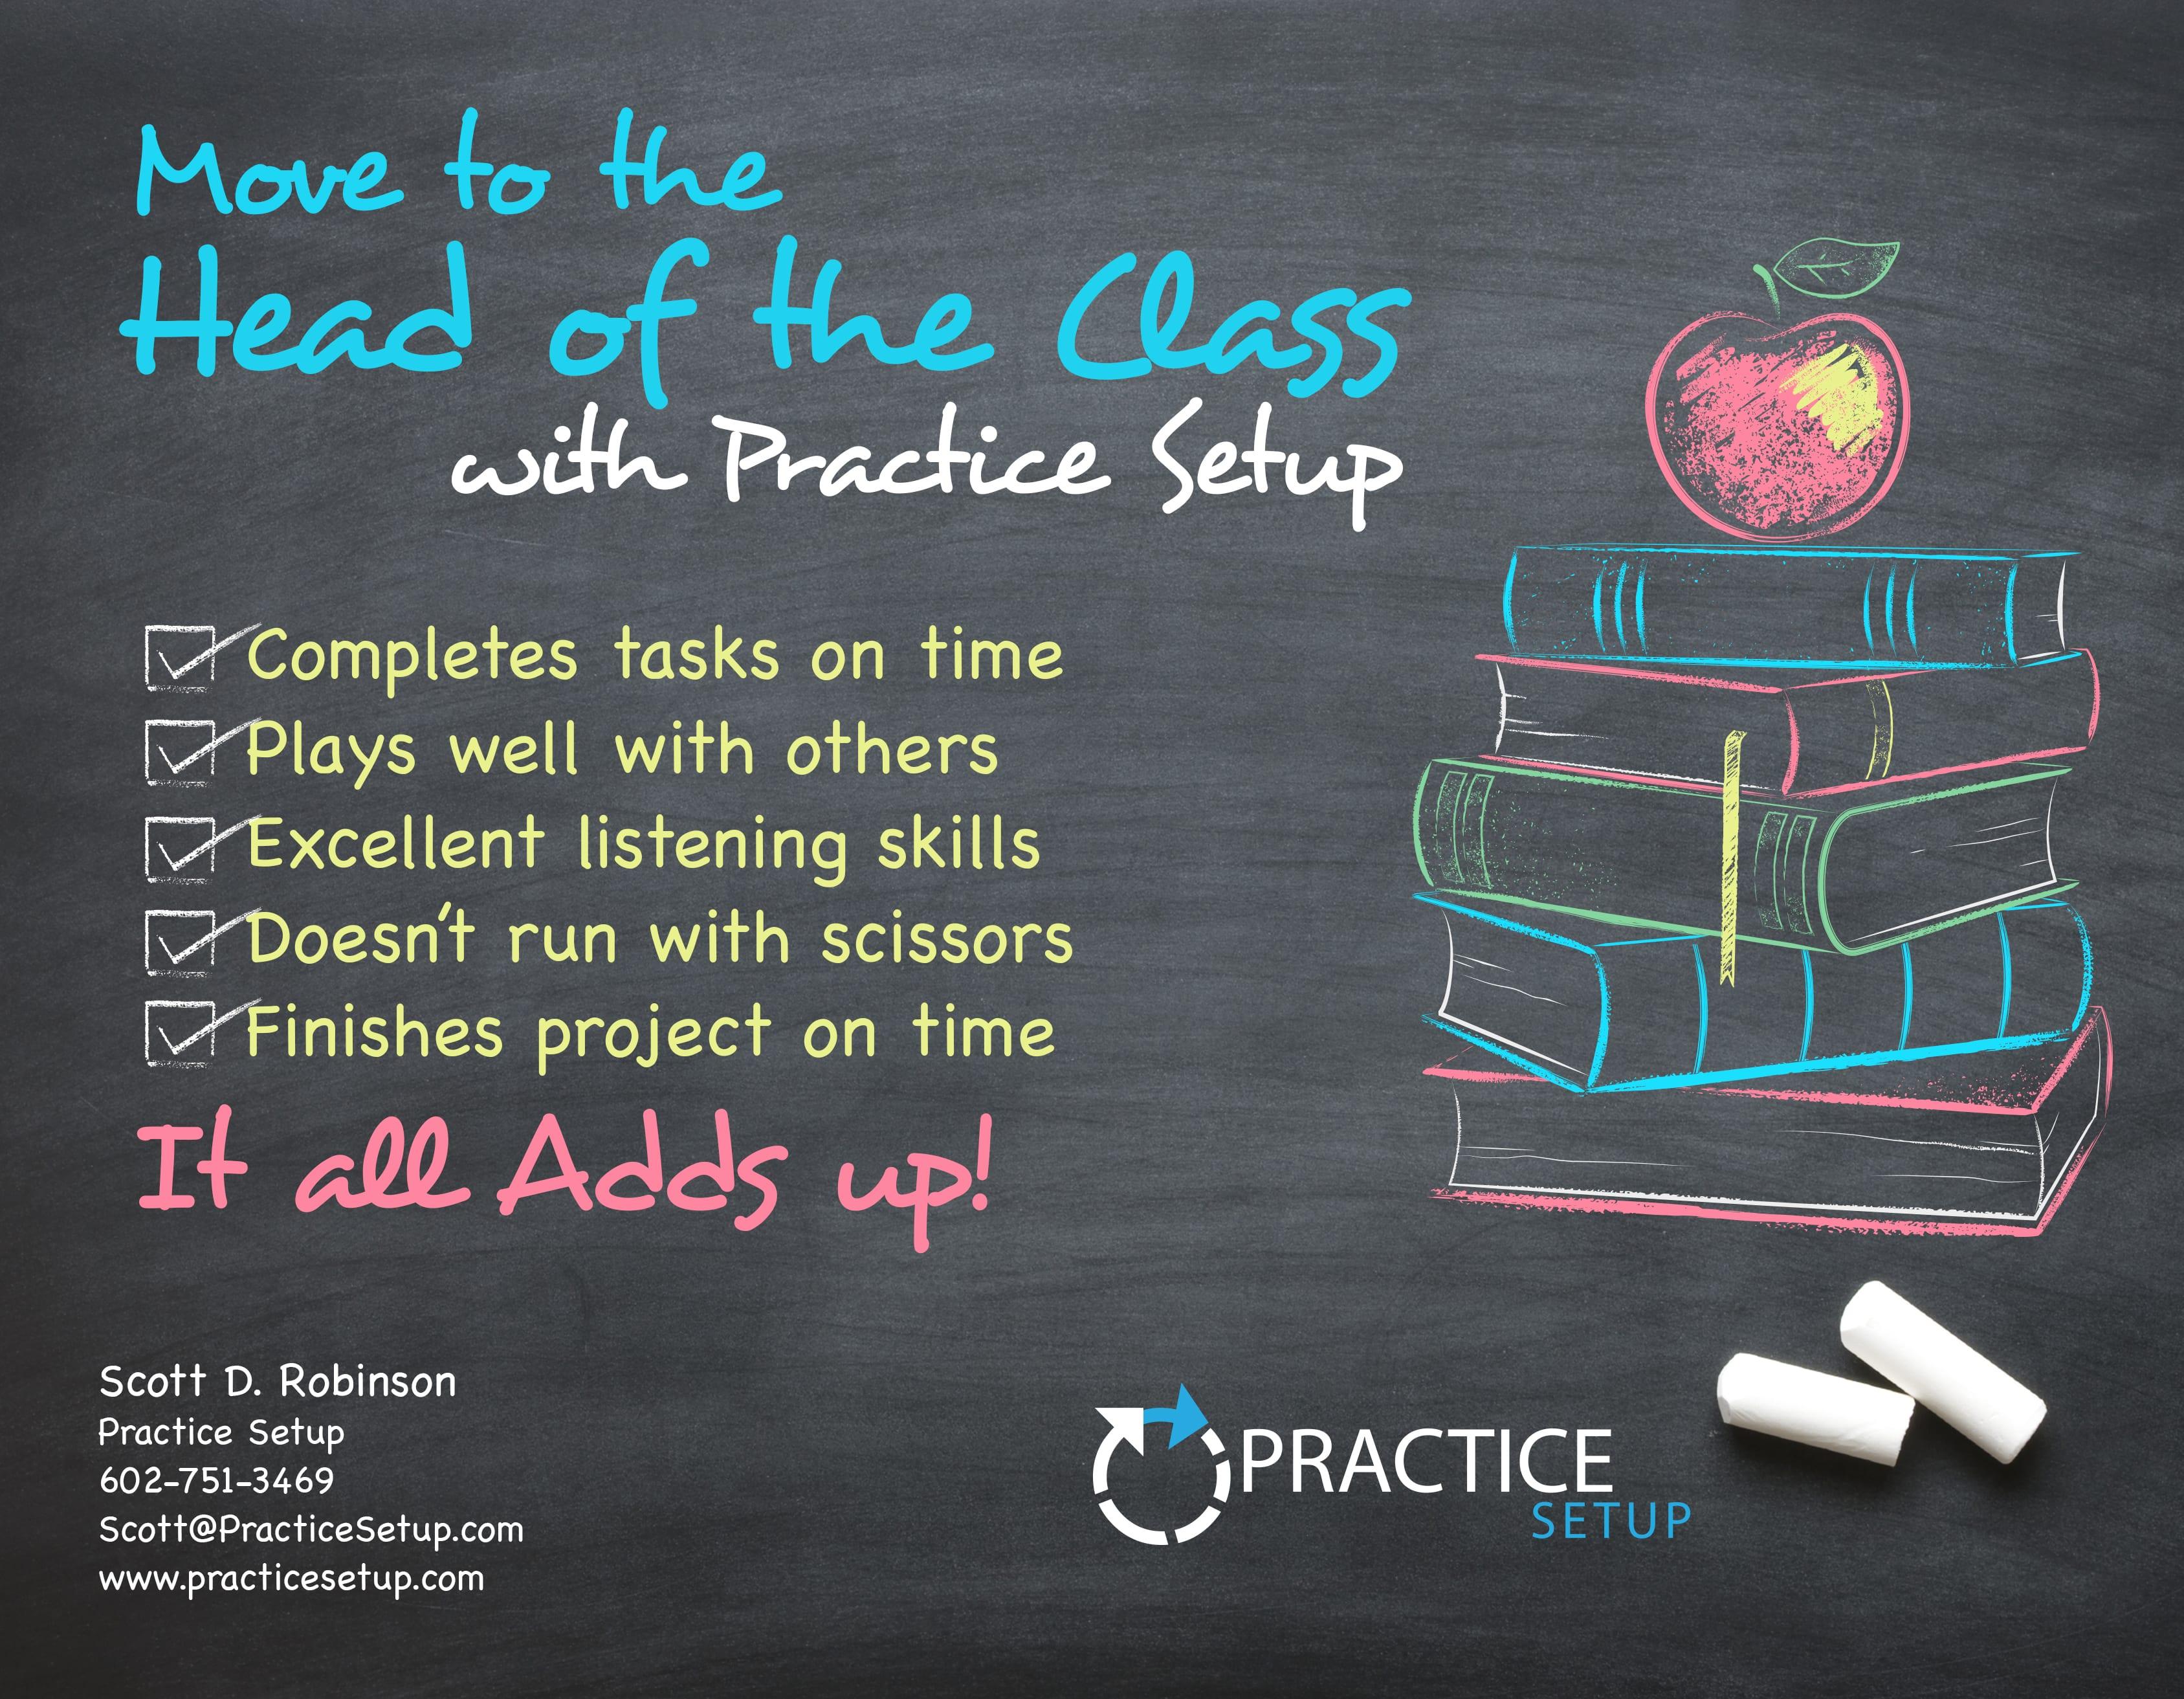 Scott Robinson - Practice Setup LLC